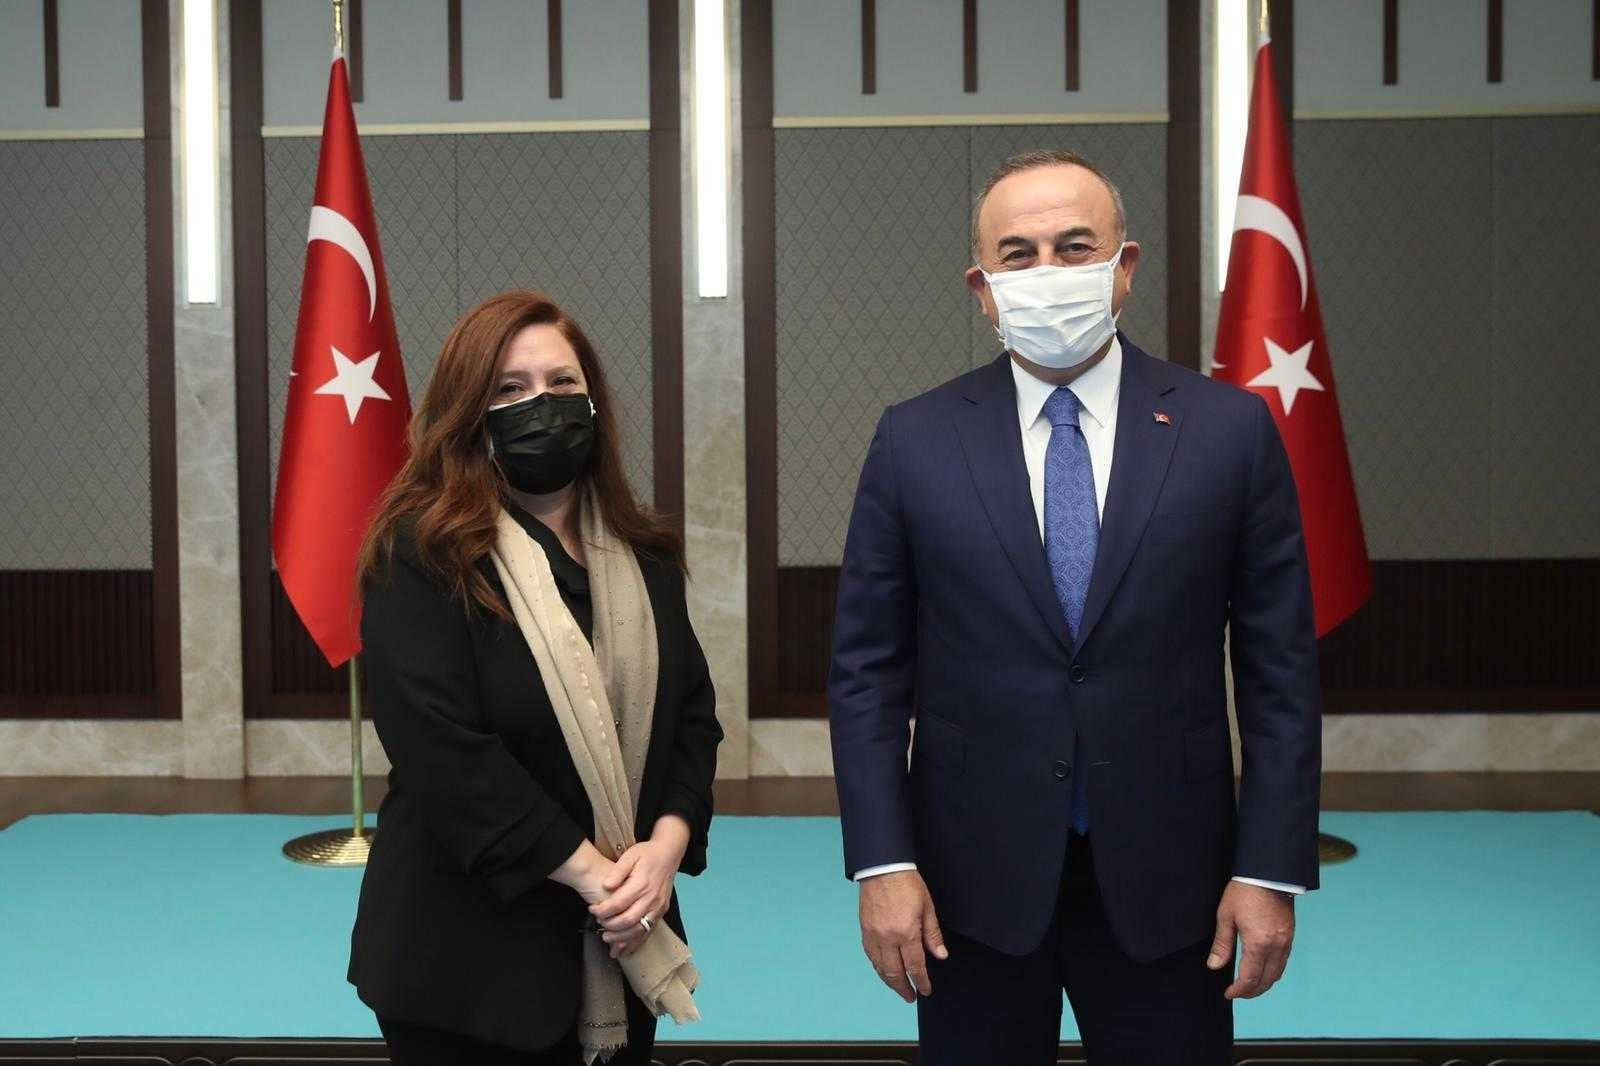 Foreign Minister Mevlüt Çavuşoğlu with Daily Sabah Ankara Representative Nur Özkan Erbay, Dec. 30, 2020 (Courtesy of the Foreign Ministry)